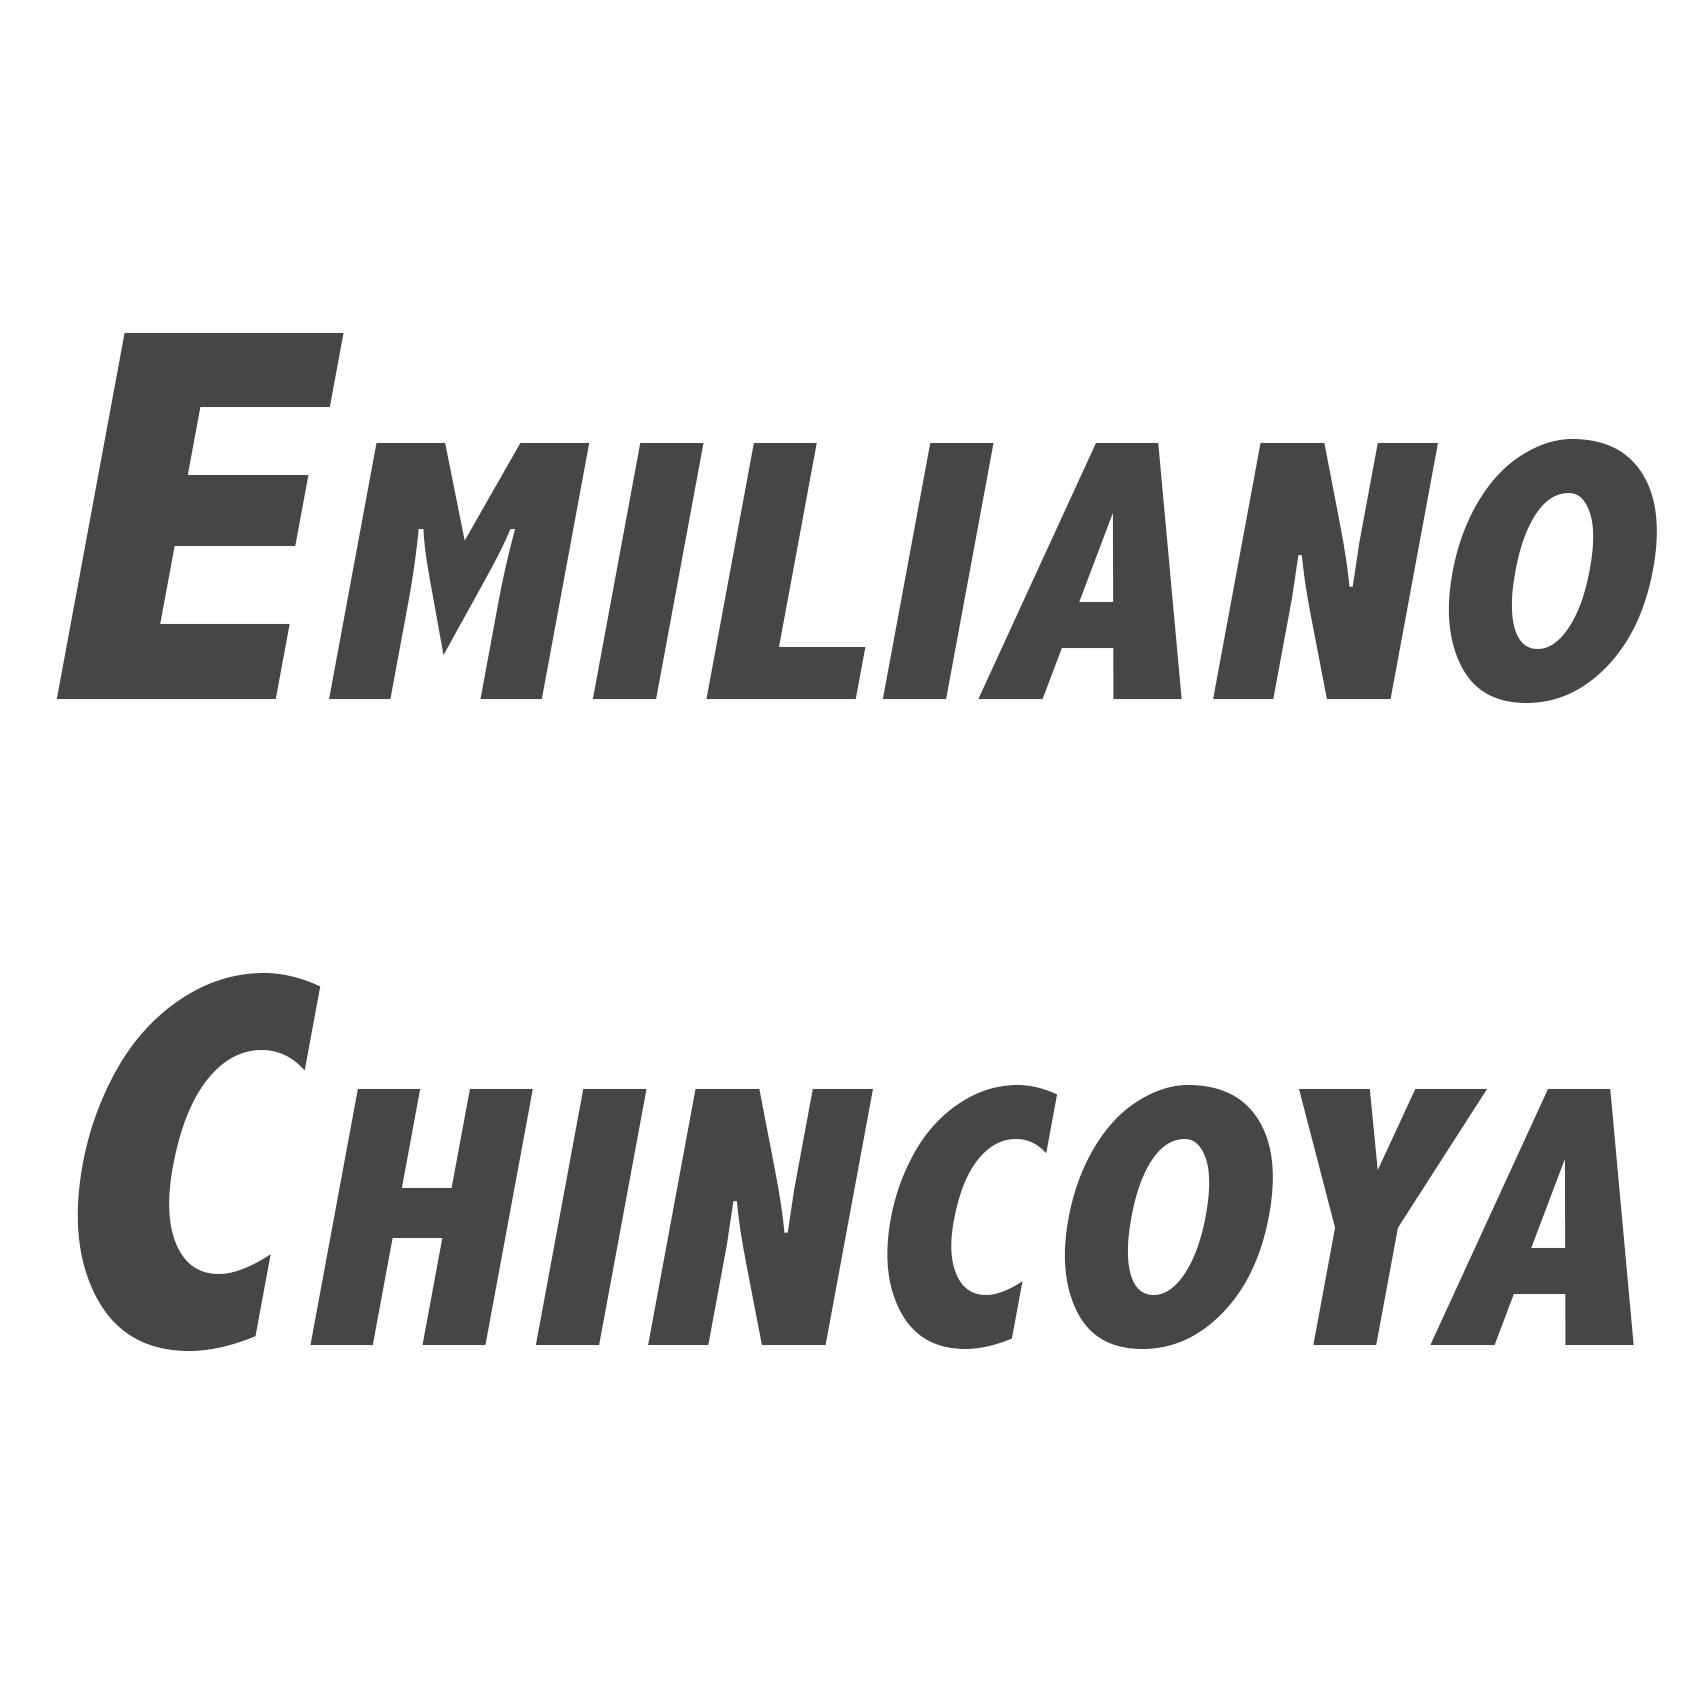 Emiliano Chincoya_